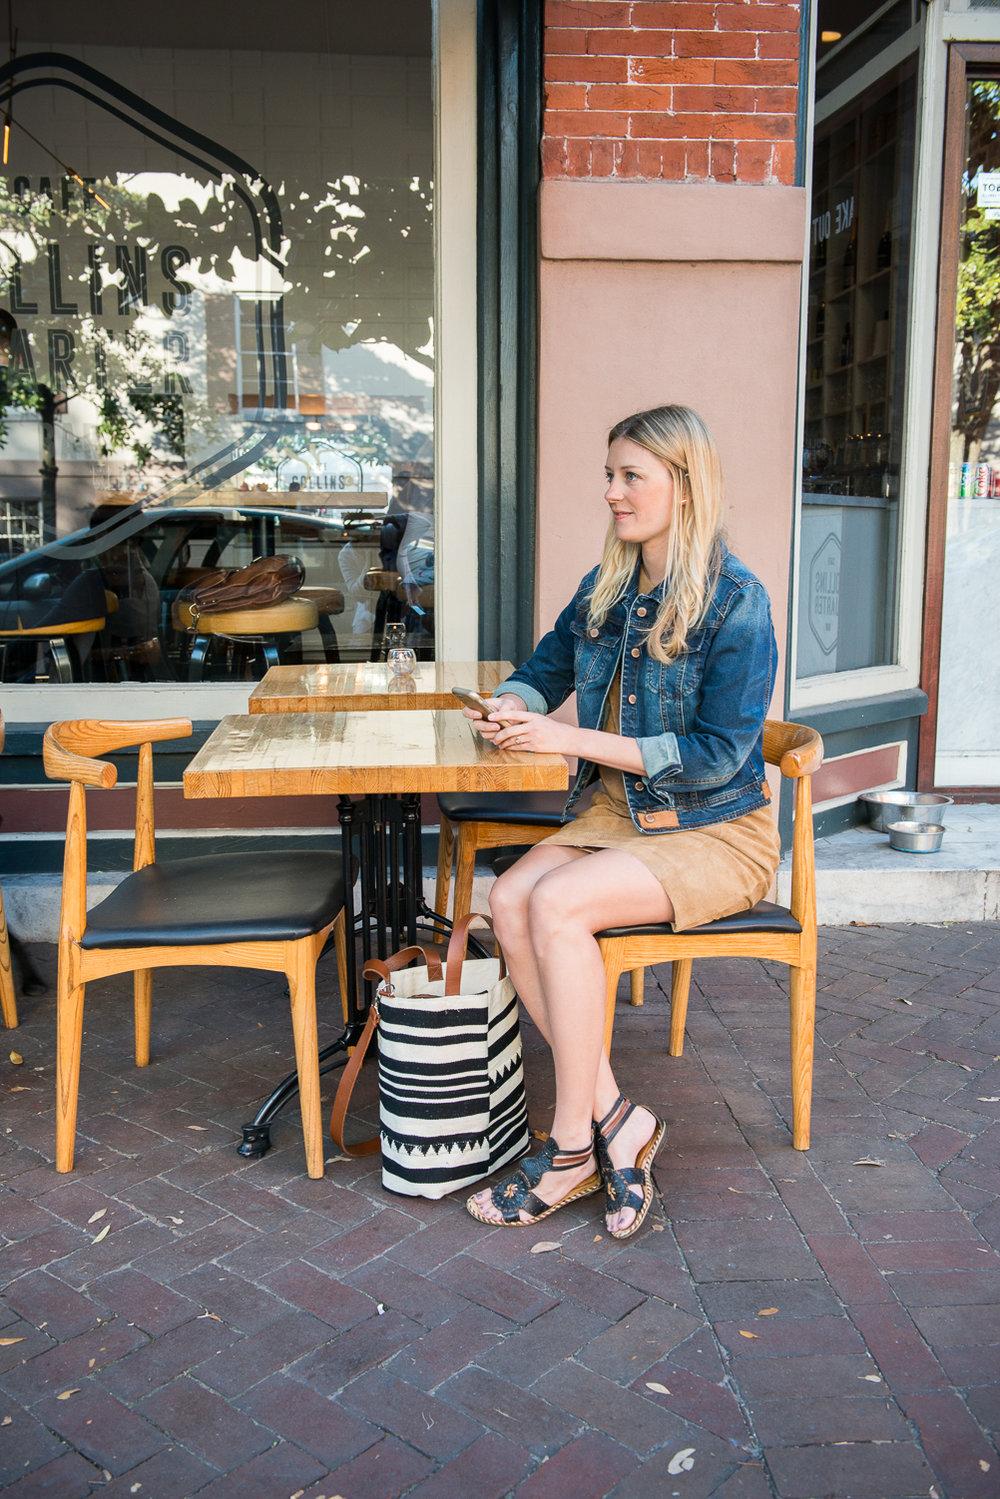 One Dress, Three Ways | Spring Outfit Ideas | Casual Outfit Ideas | Casual Outfits | Personal Style | Spring Style | Spring Outfits for Women | Casual Outfits for Women | Neutral Outfit Ideas | How to Style a Neutral Dress | Kara Bettie | Paprika Southern